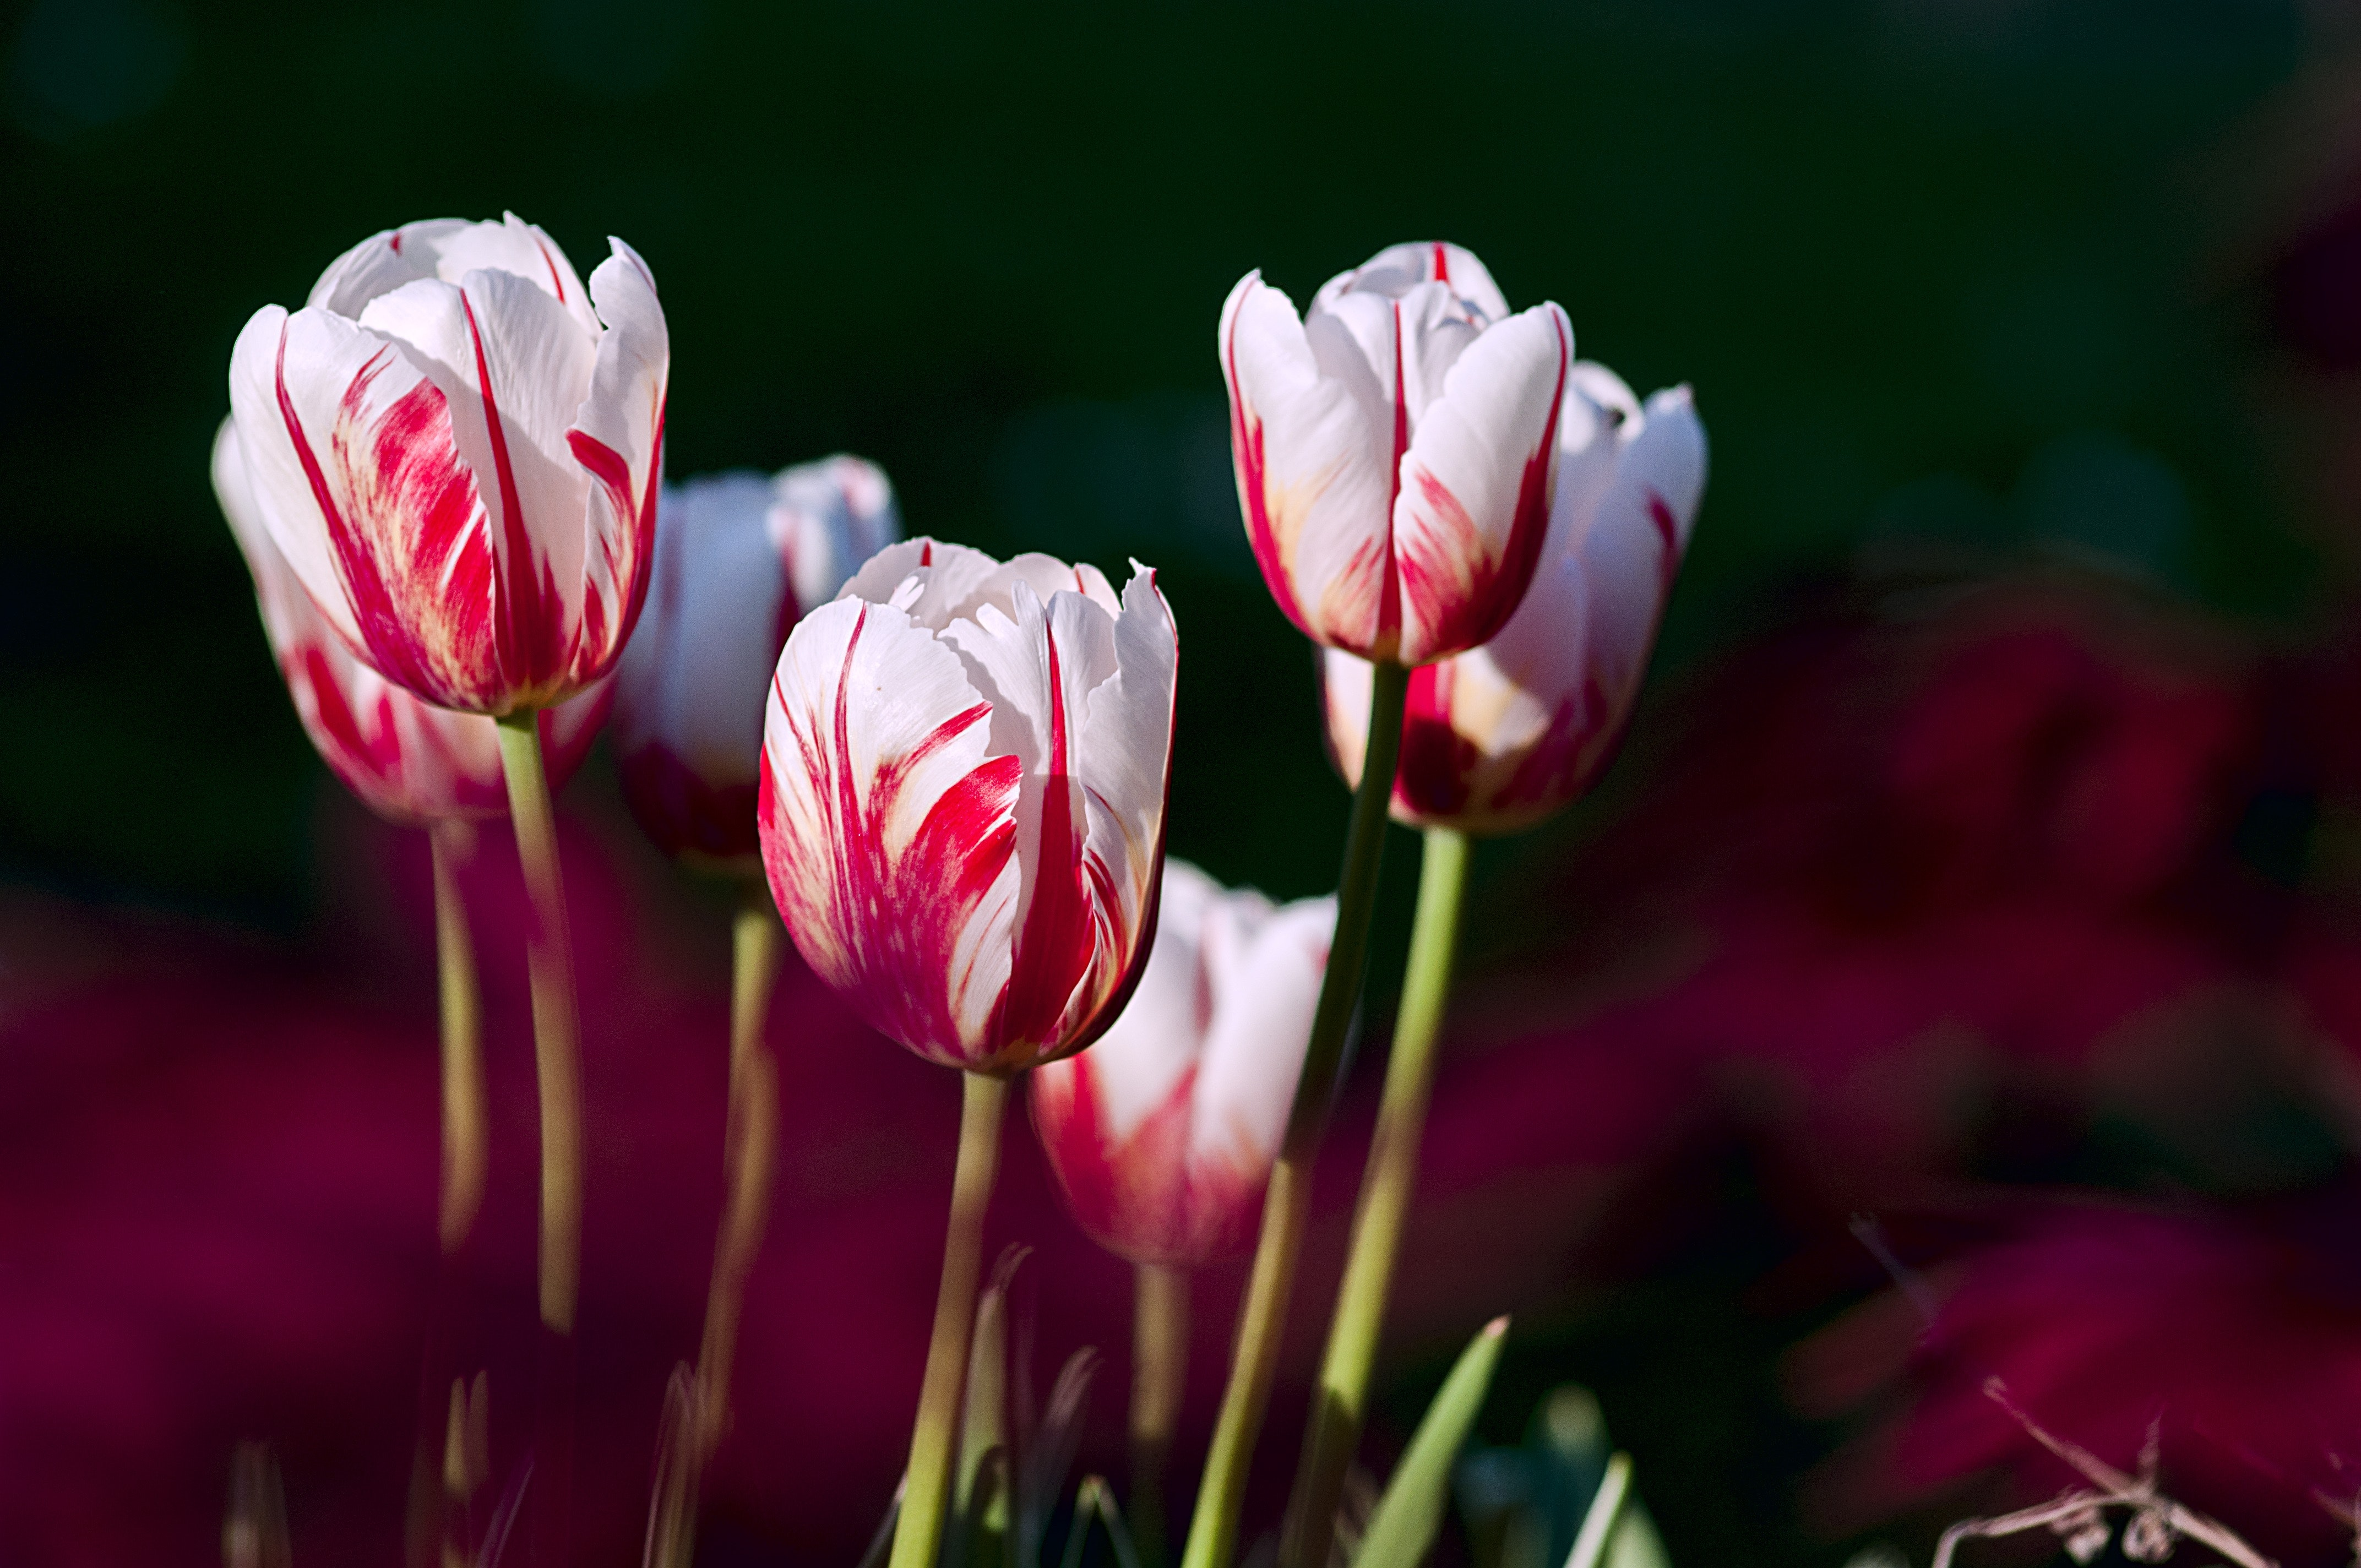 250 Great Tulips Photos Pexels Free Stock Photos